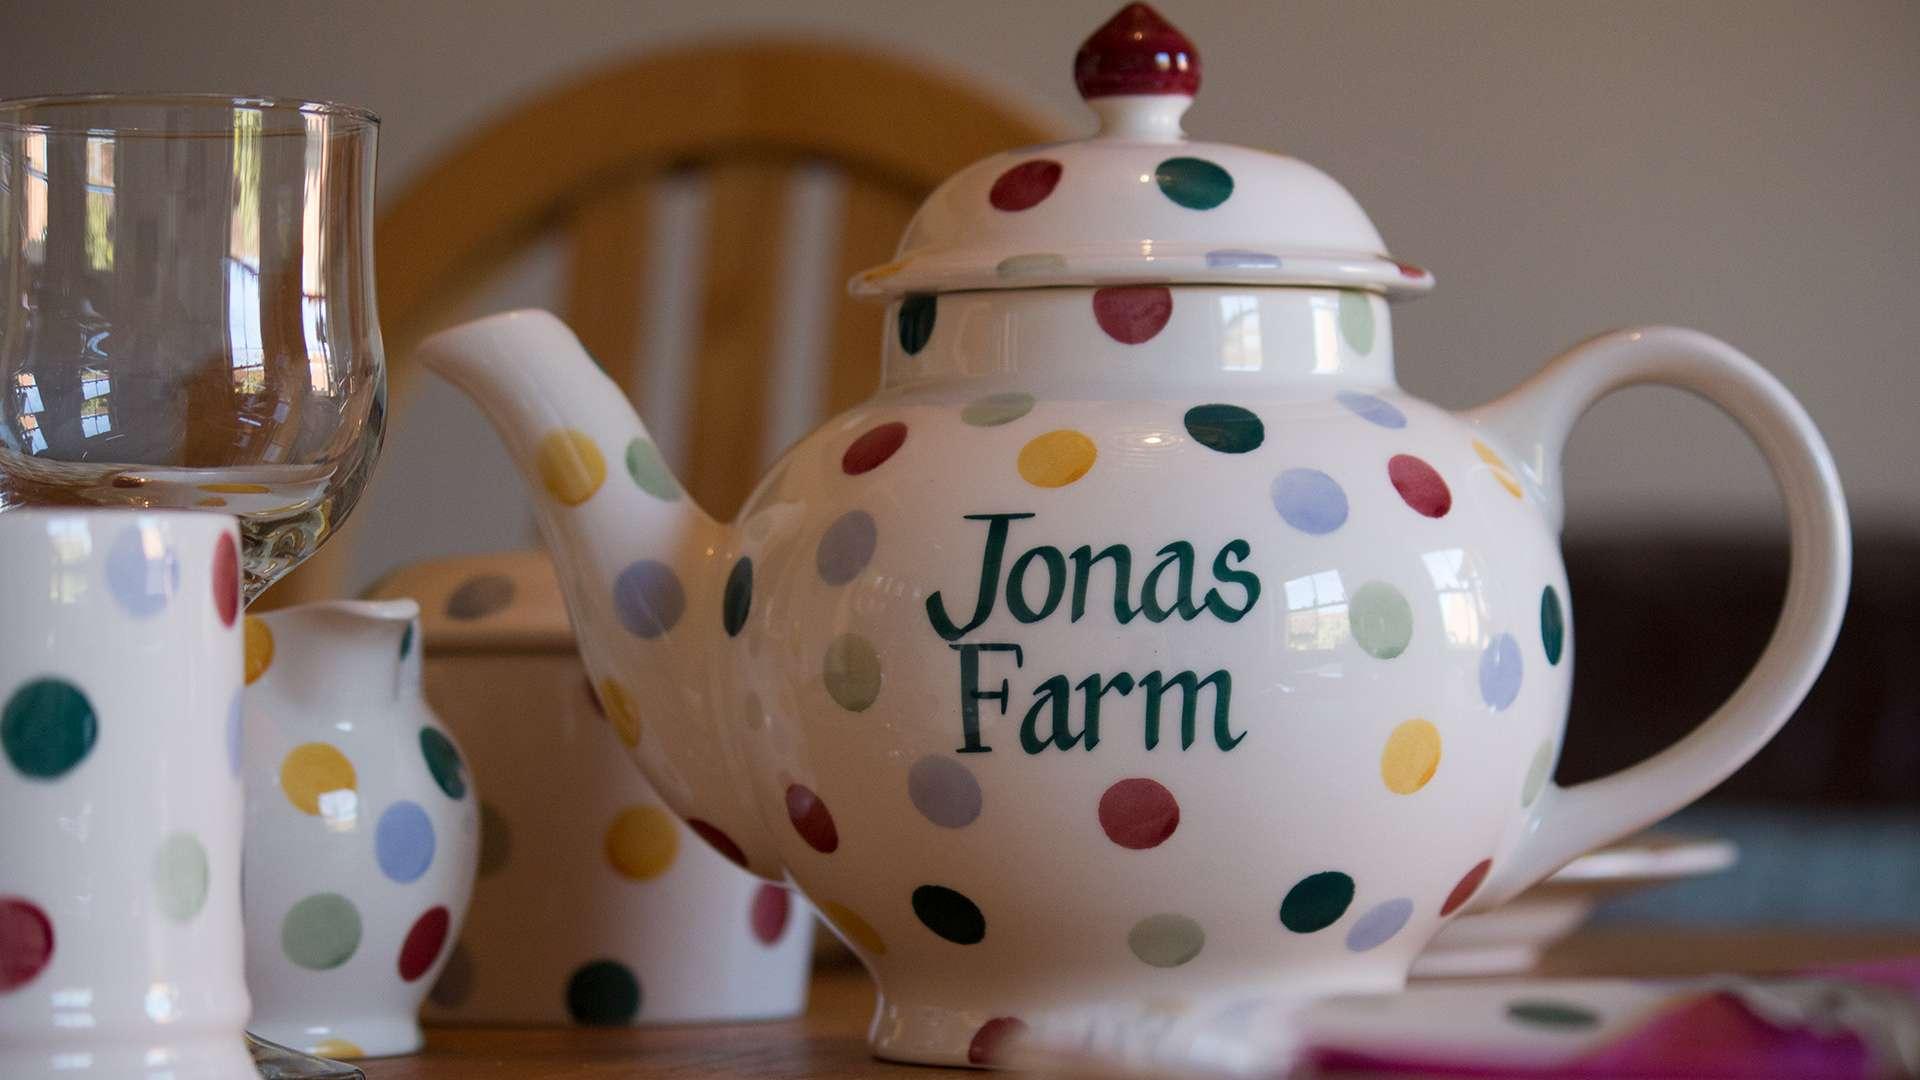 Strange Jonas Farmhouse Bed And Breakfast Near Cromer In Norfolk Download Free Architecture Designs Photstoregrimeyleaguecom